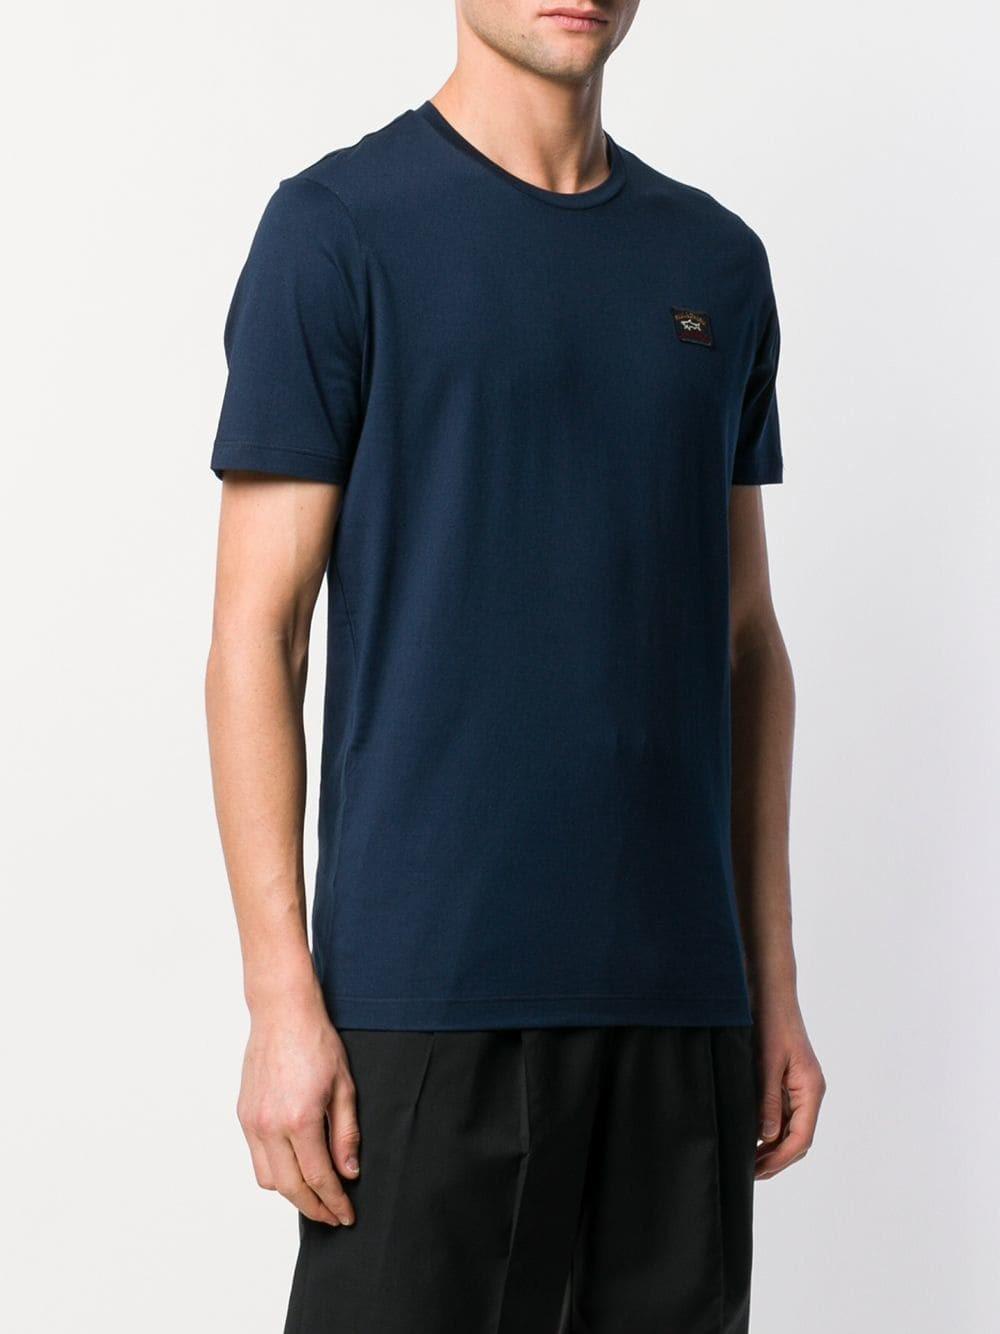 paul shark t shirt available on 29317. Black Bedroom Furniture Sets. Home Design Ideas